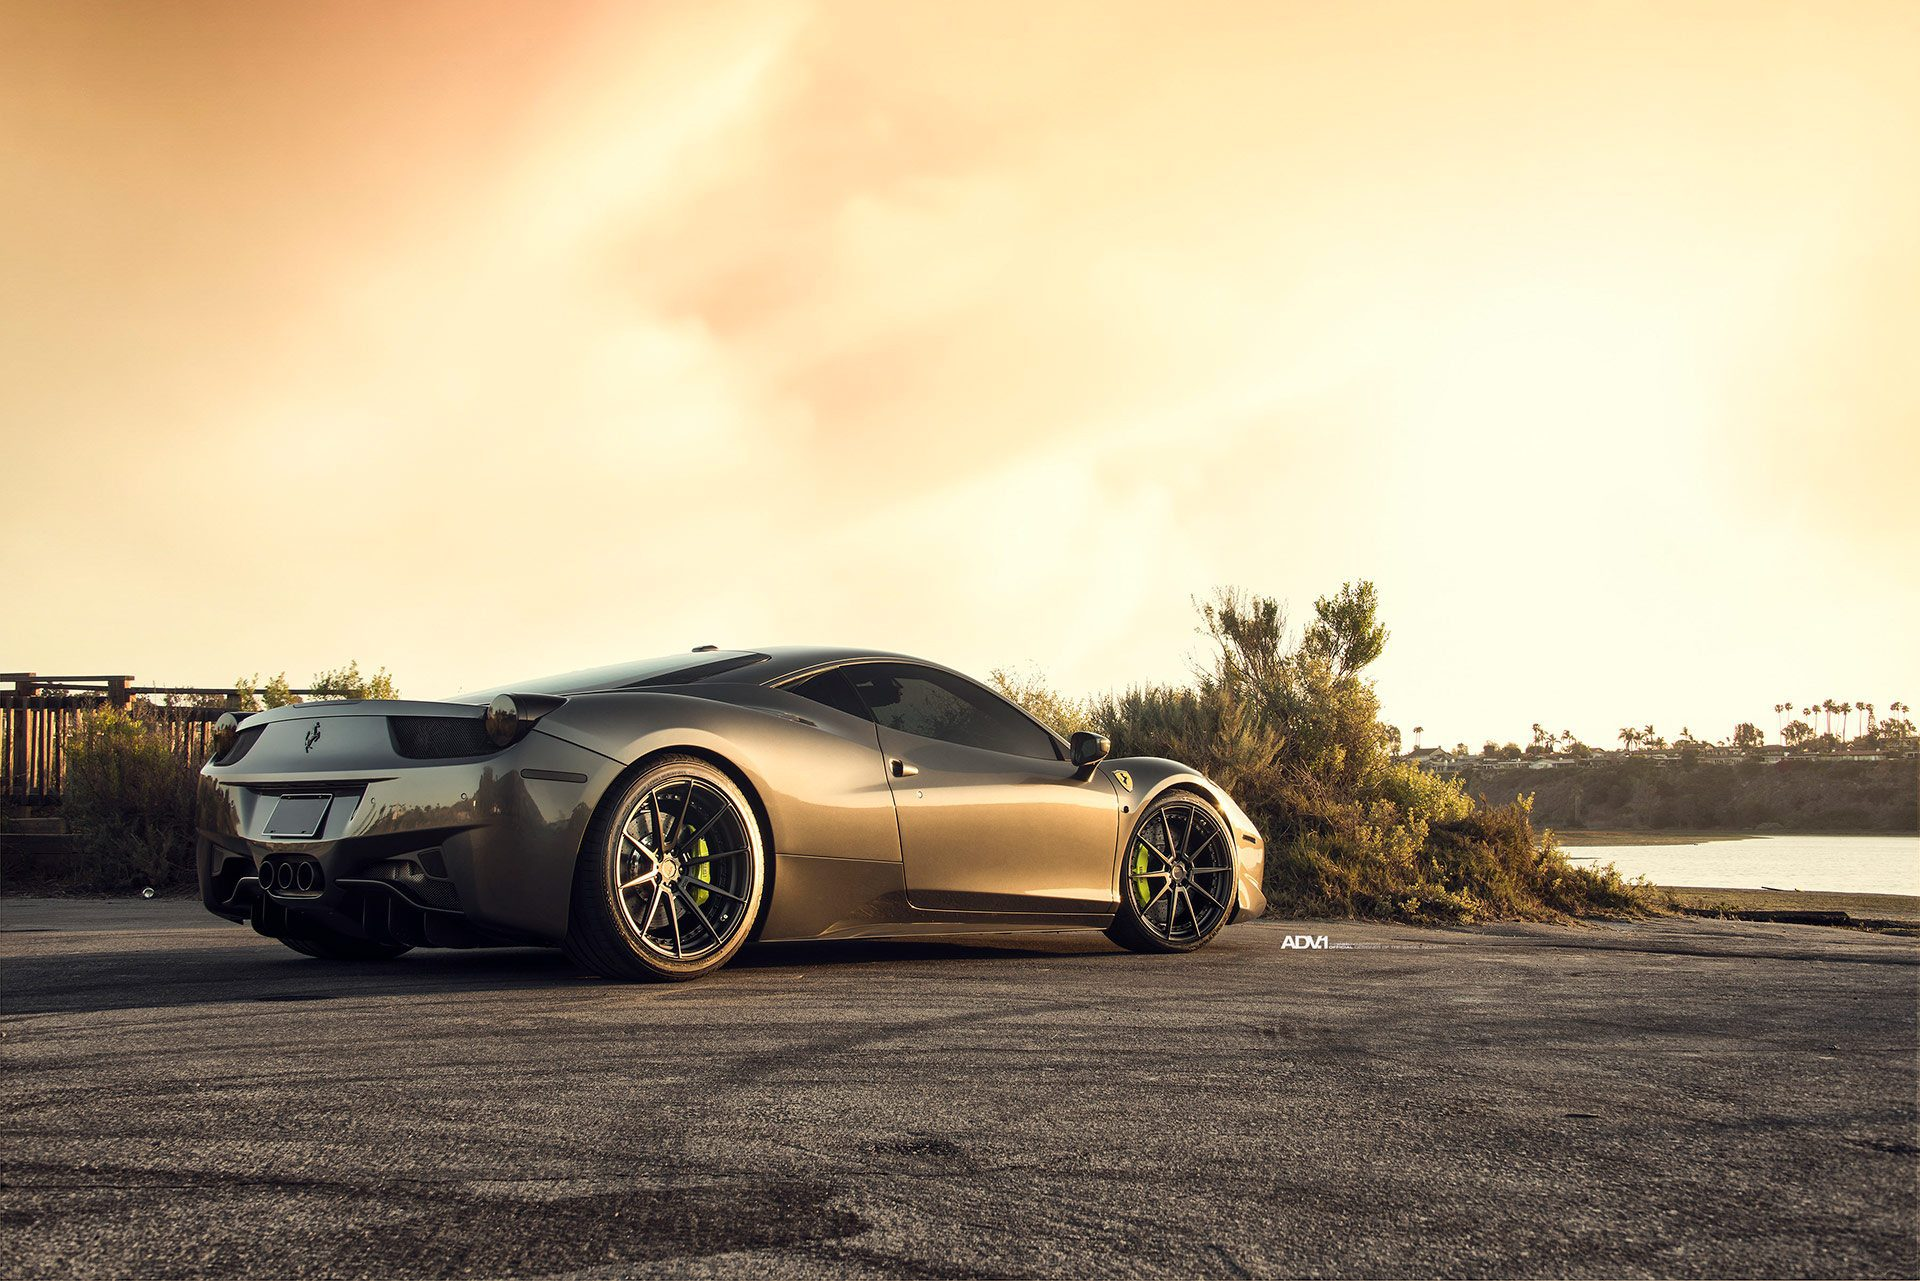 Grigio Silverstone Metallic Ferrari 458 Italia Gets ADV.1 Wheels